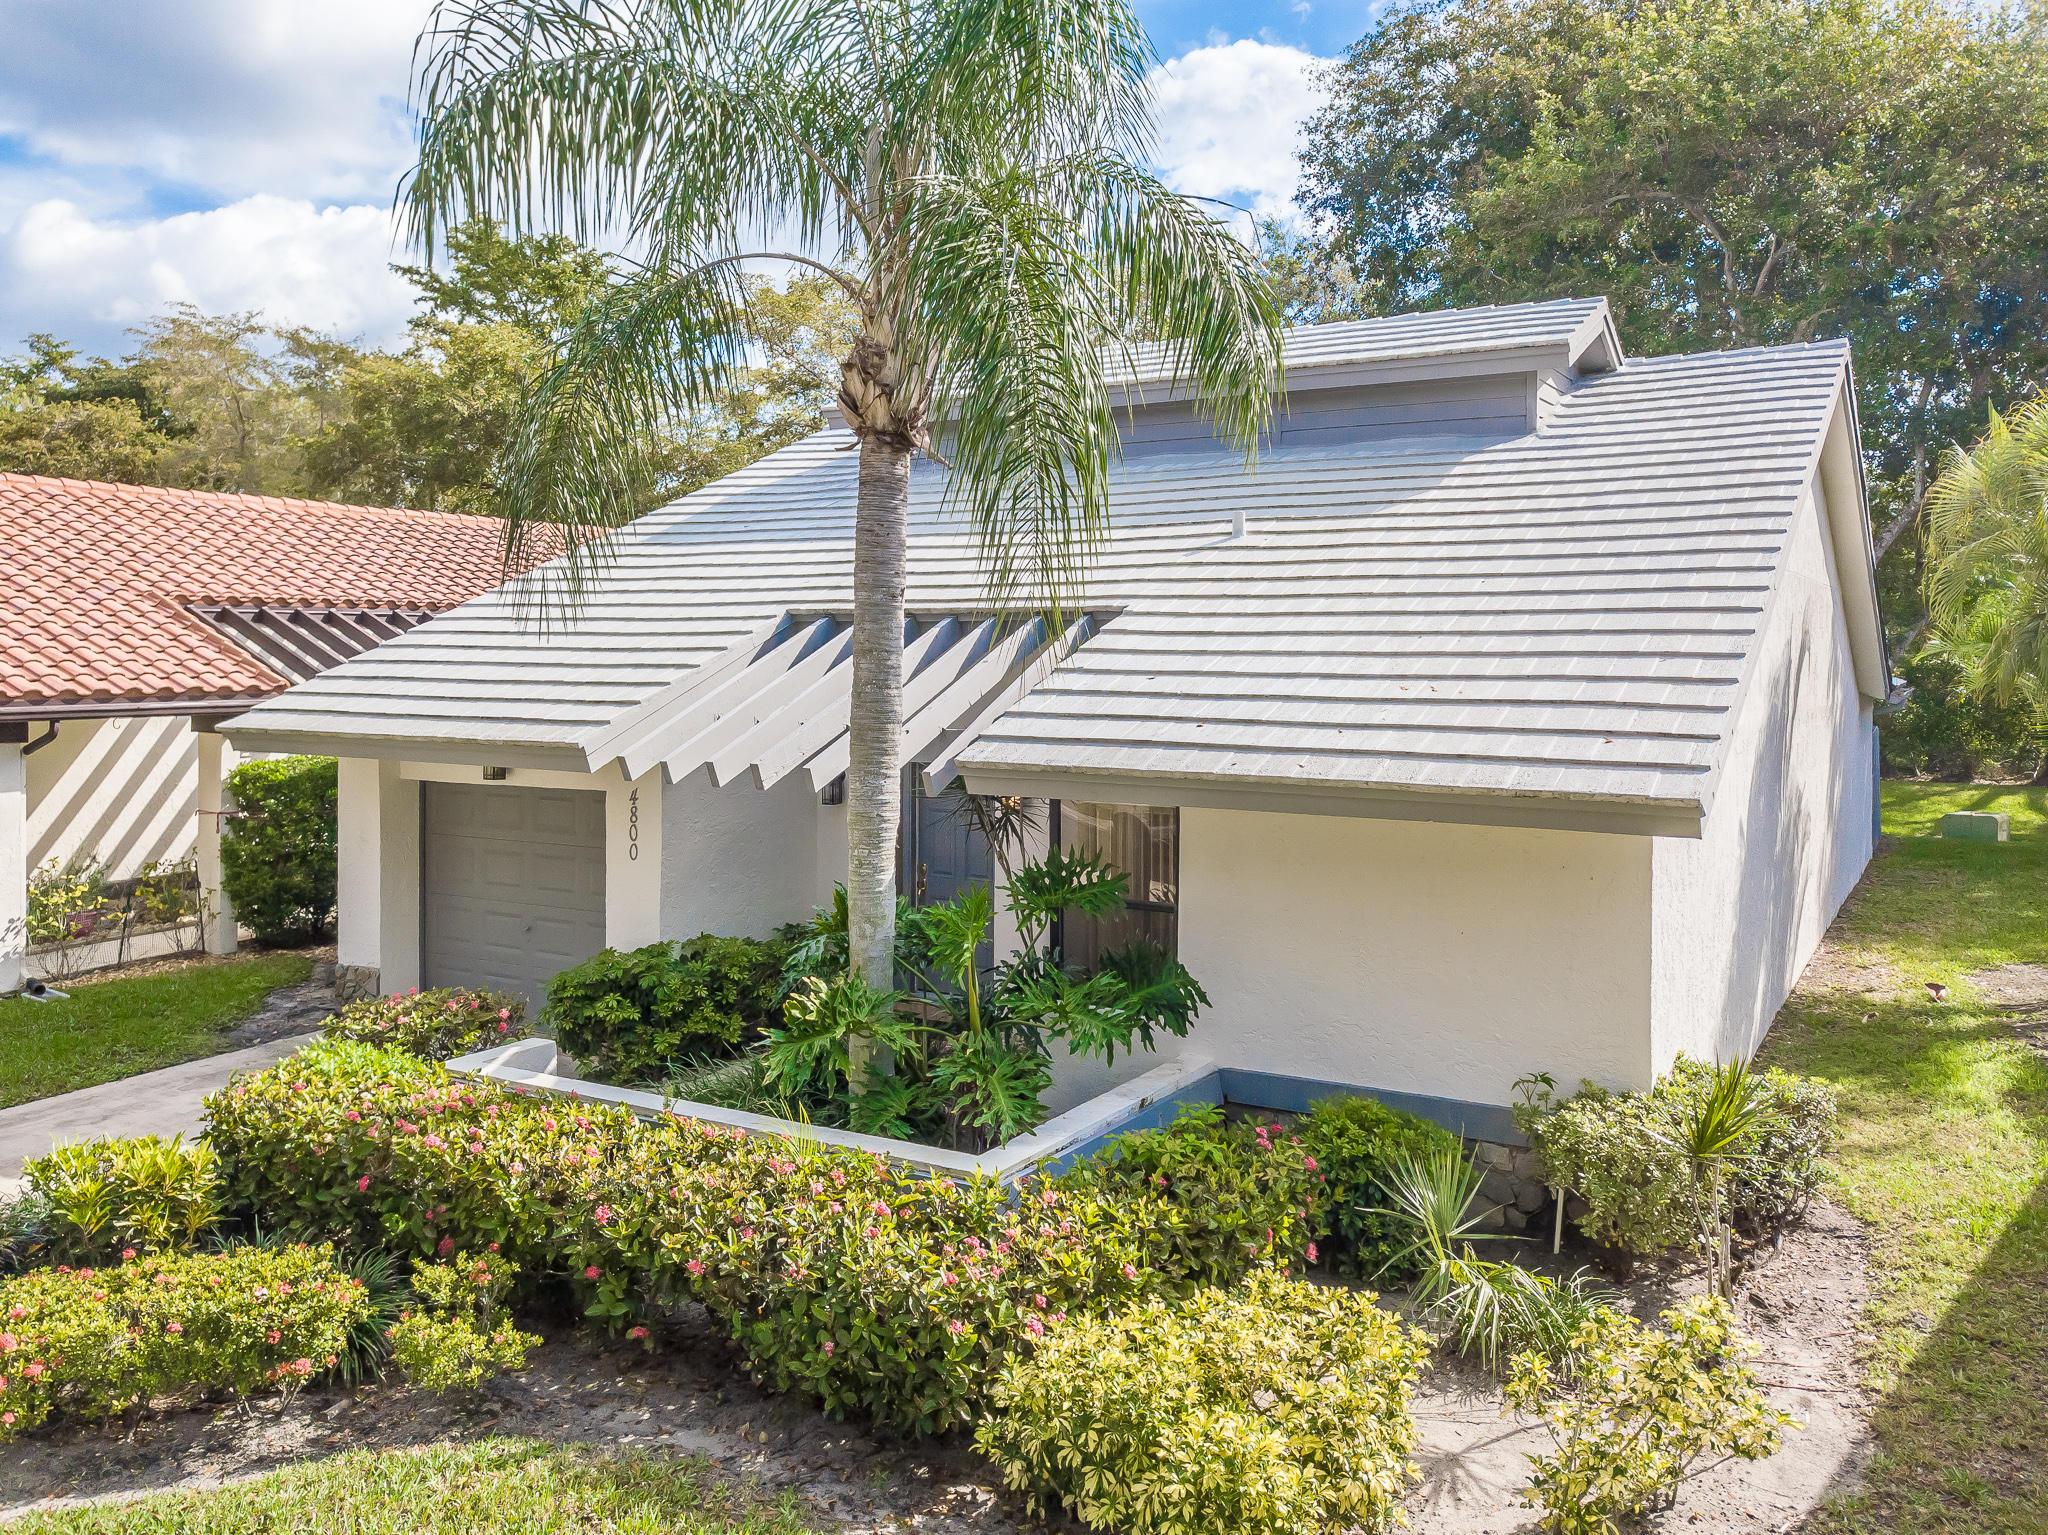 4800 Boxwood Circle, Boynton Beach, Florida 33436, 2 Bedrooms Bedrooms, ,2 BathroomsBathrooms,Single Family,For Sale,FAIRMONT PLACE,Boxwood,1,RX-10509341